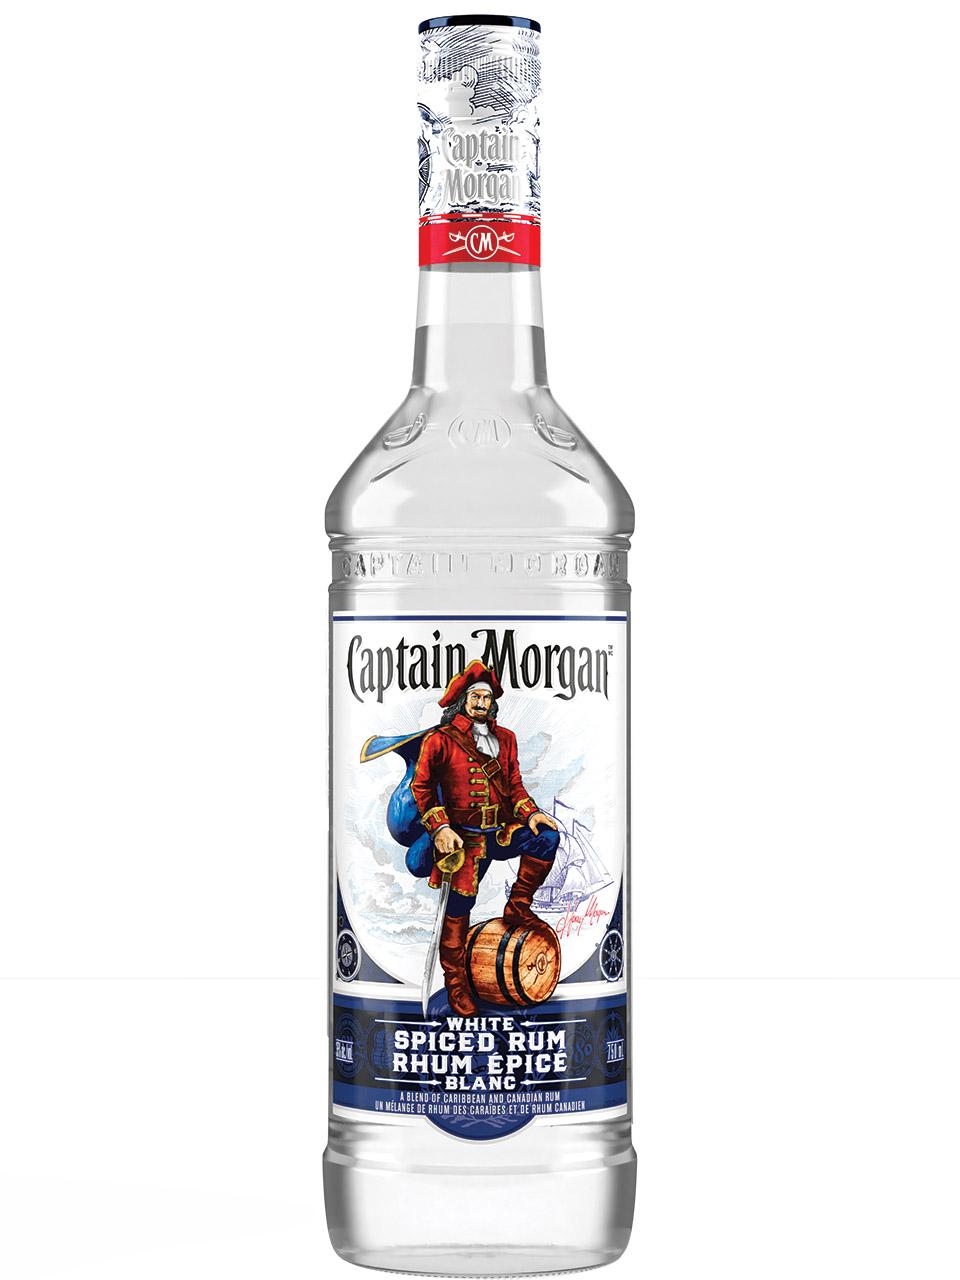 Captain Morgan White Spiced Rum